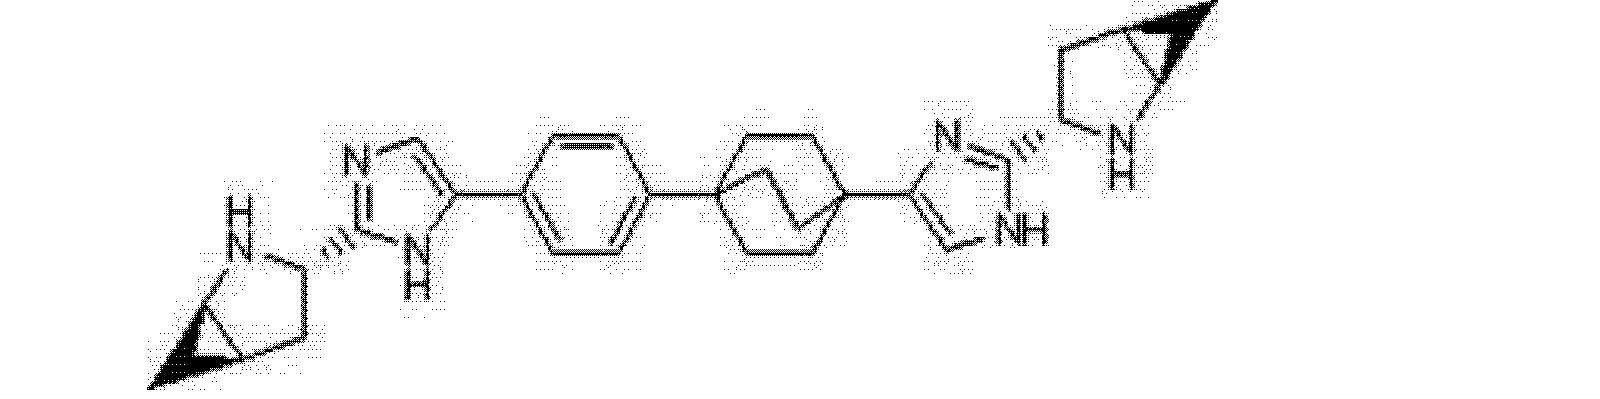 Figure CN102378762AD01432